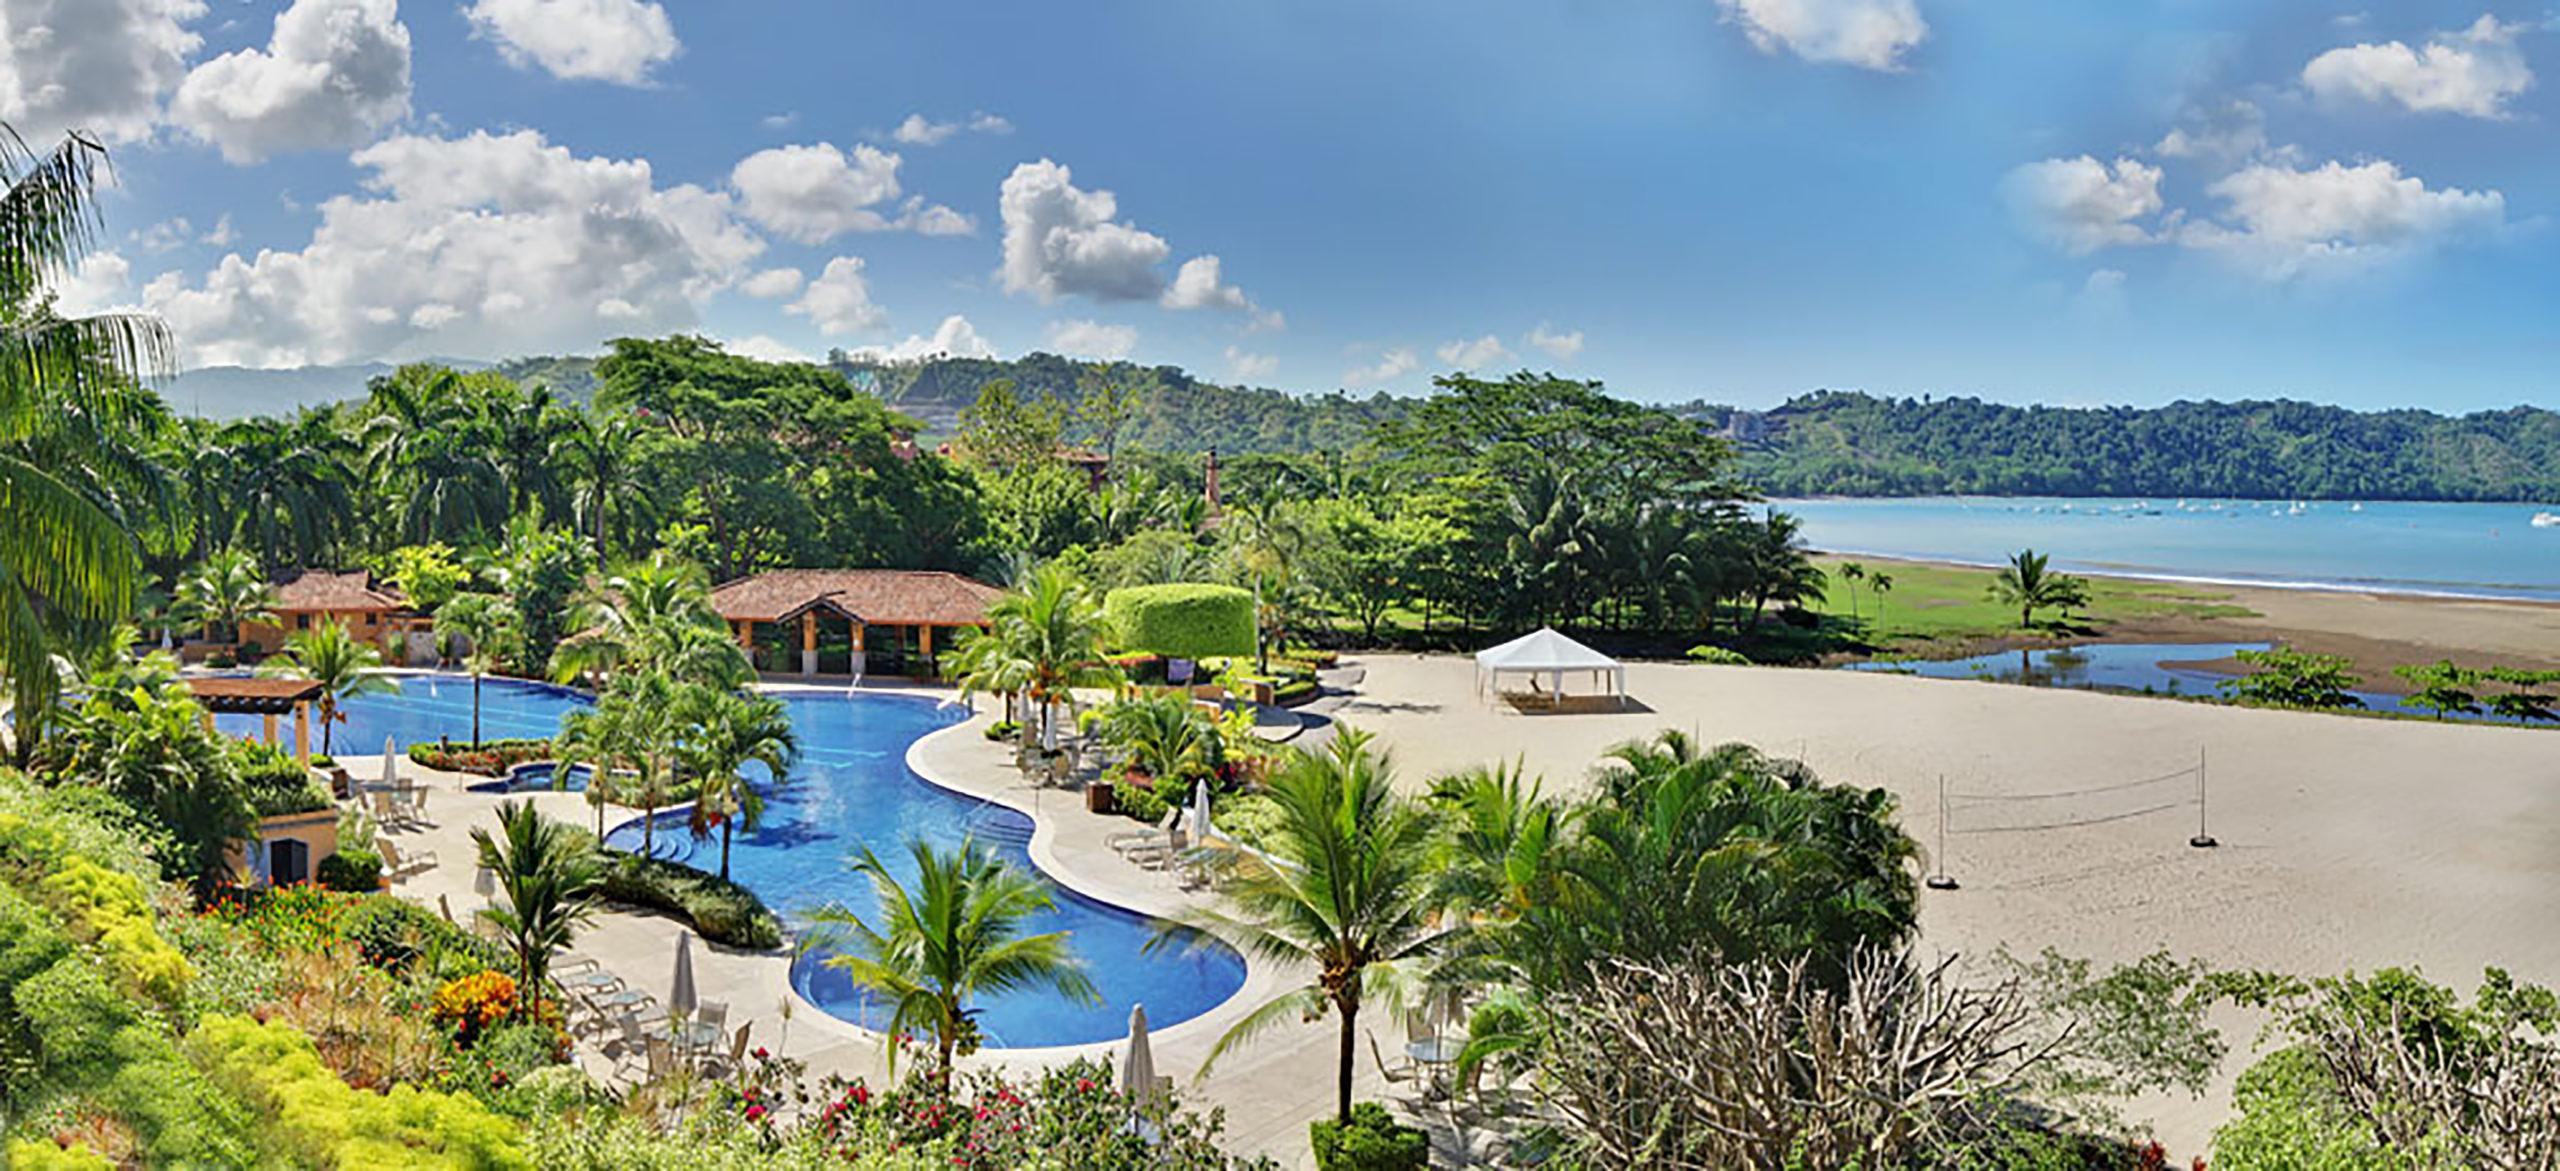 Costa Rica Luxury Life Style (4)